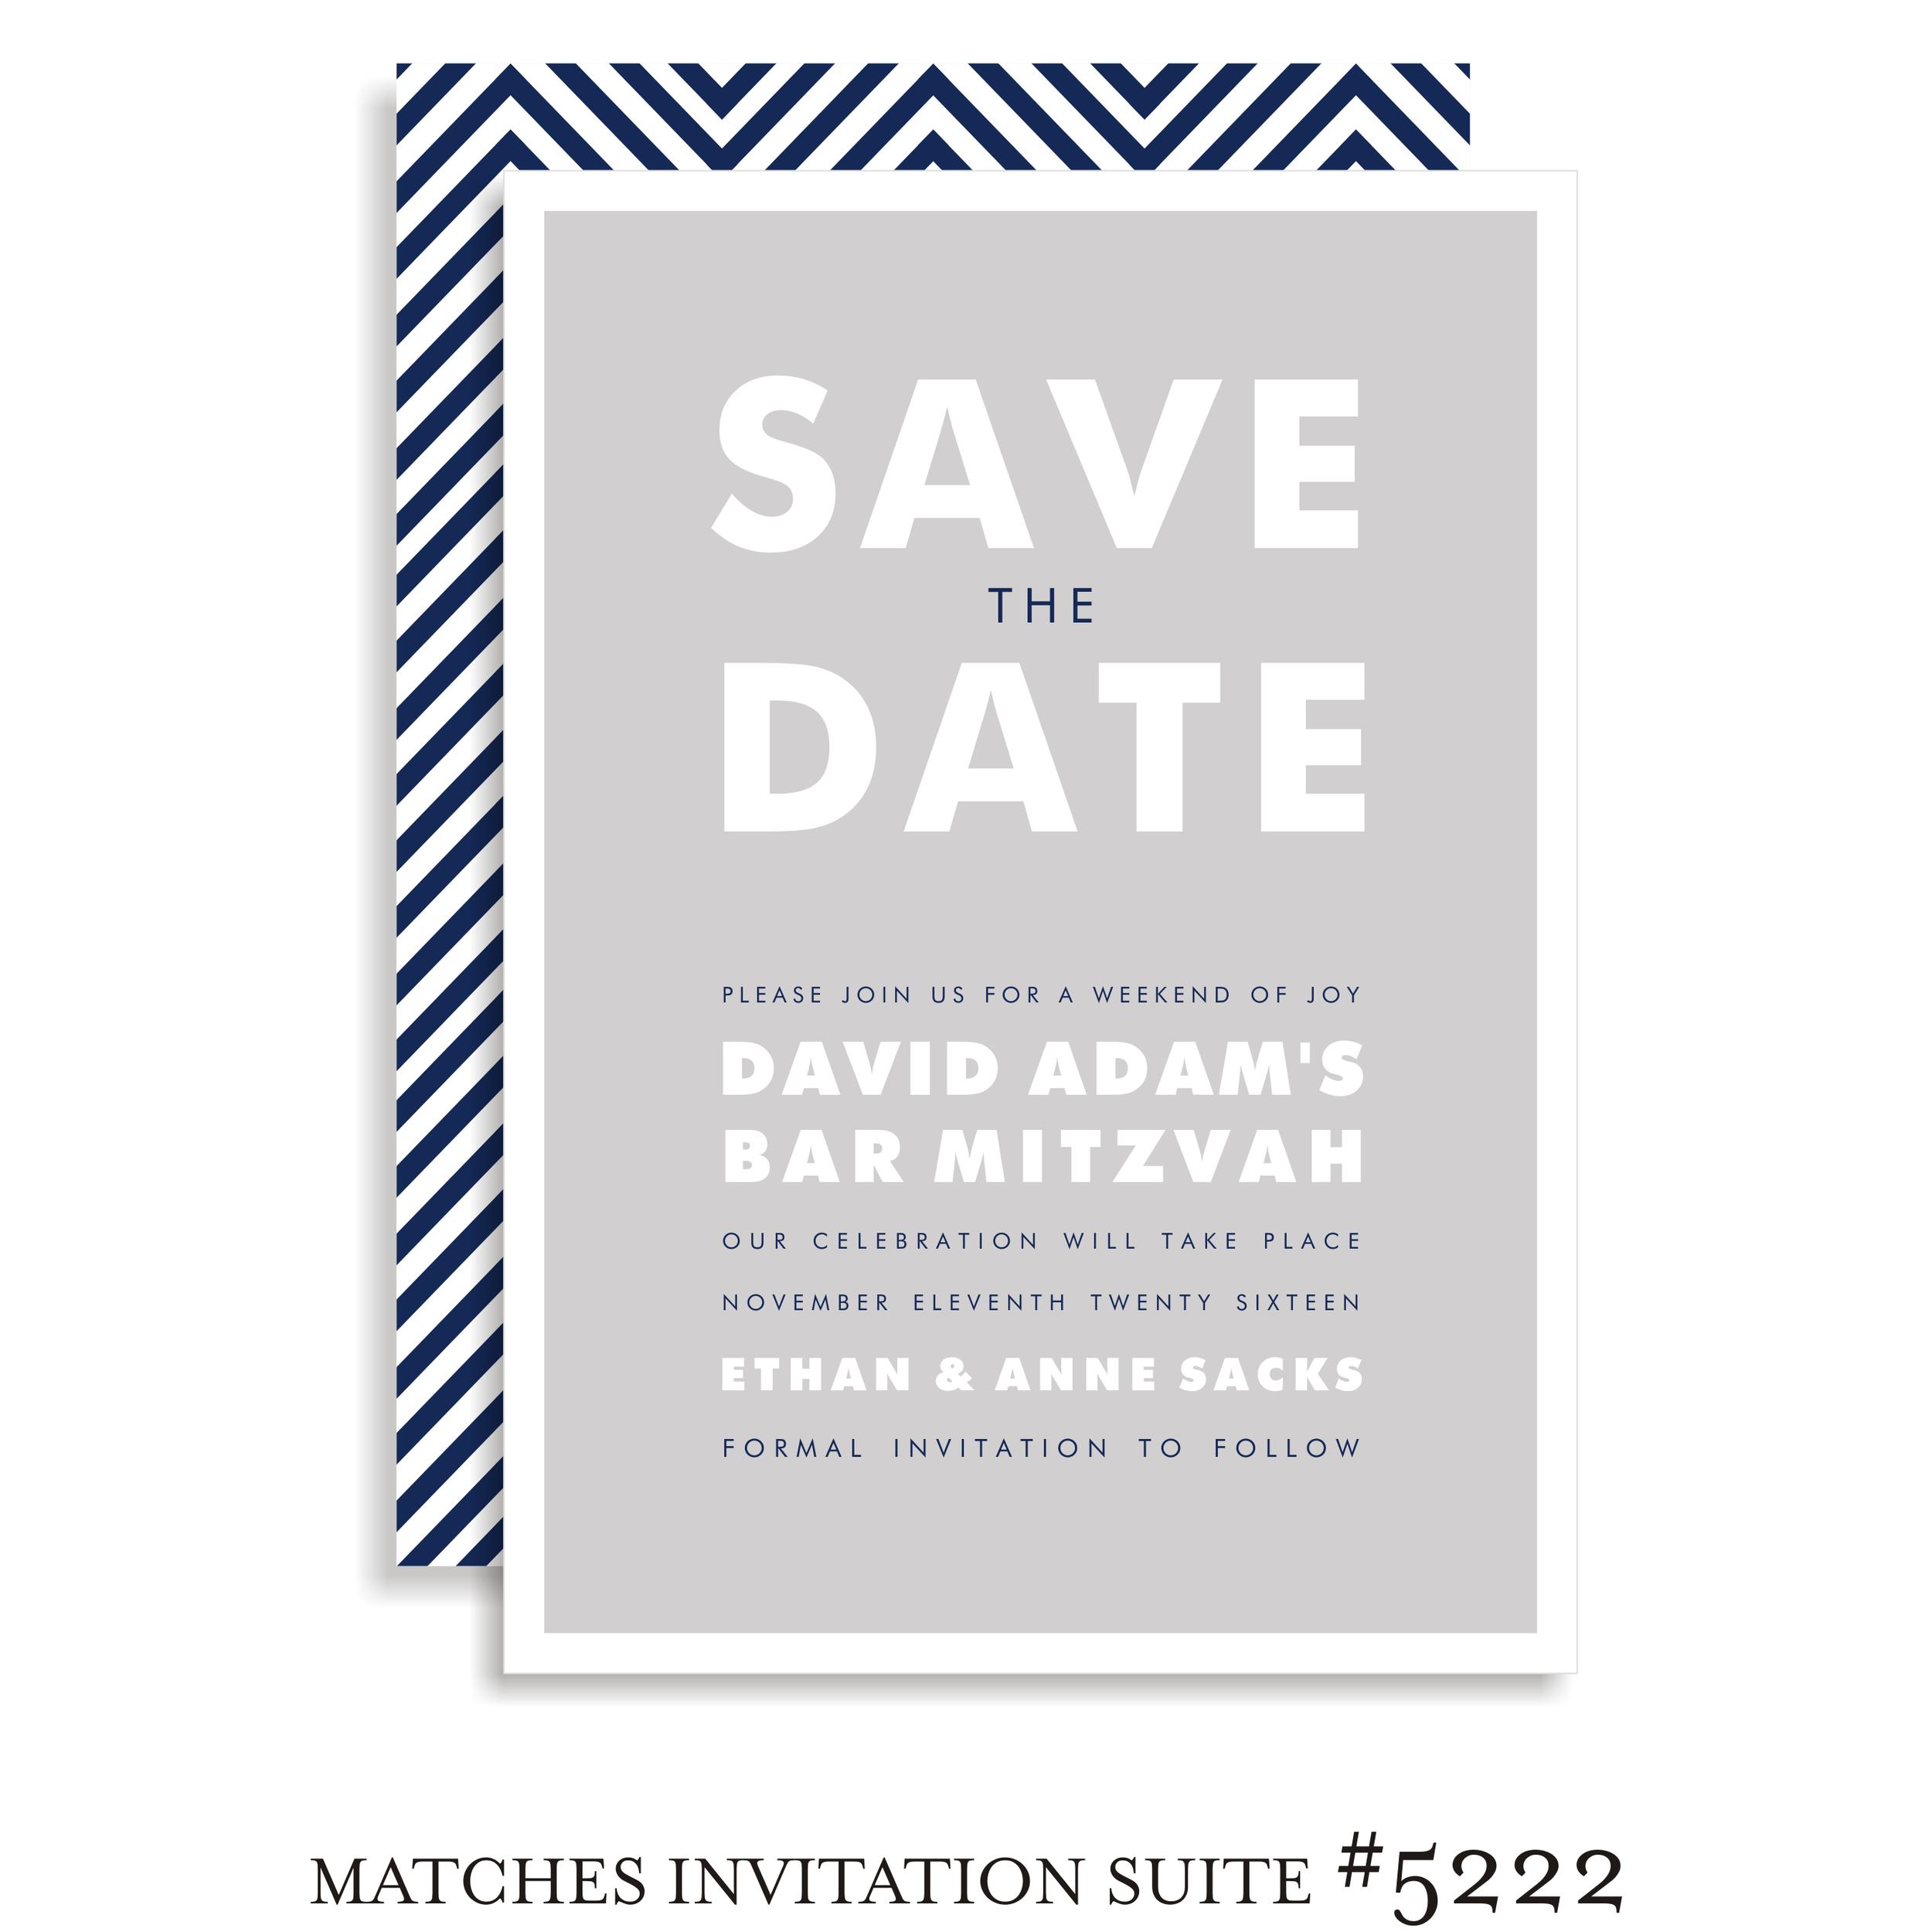 Save the Date Bar Mitzvah Suite 5222 - David Adam